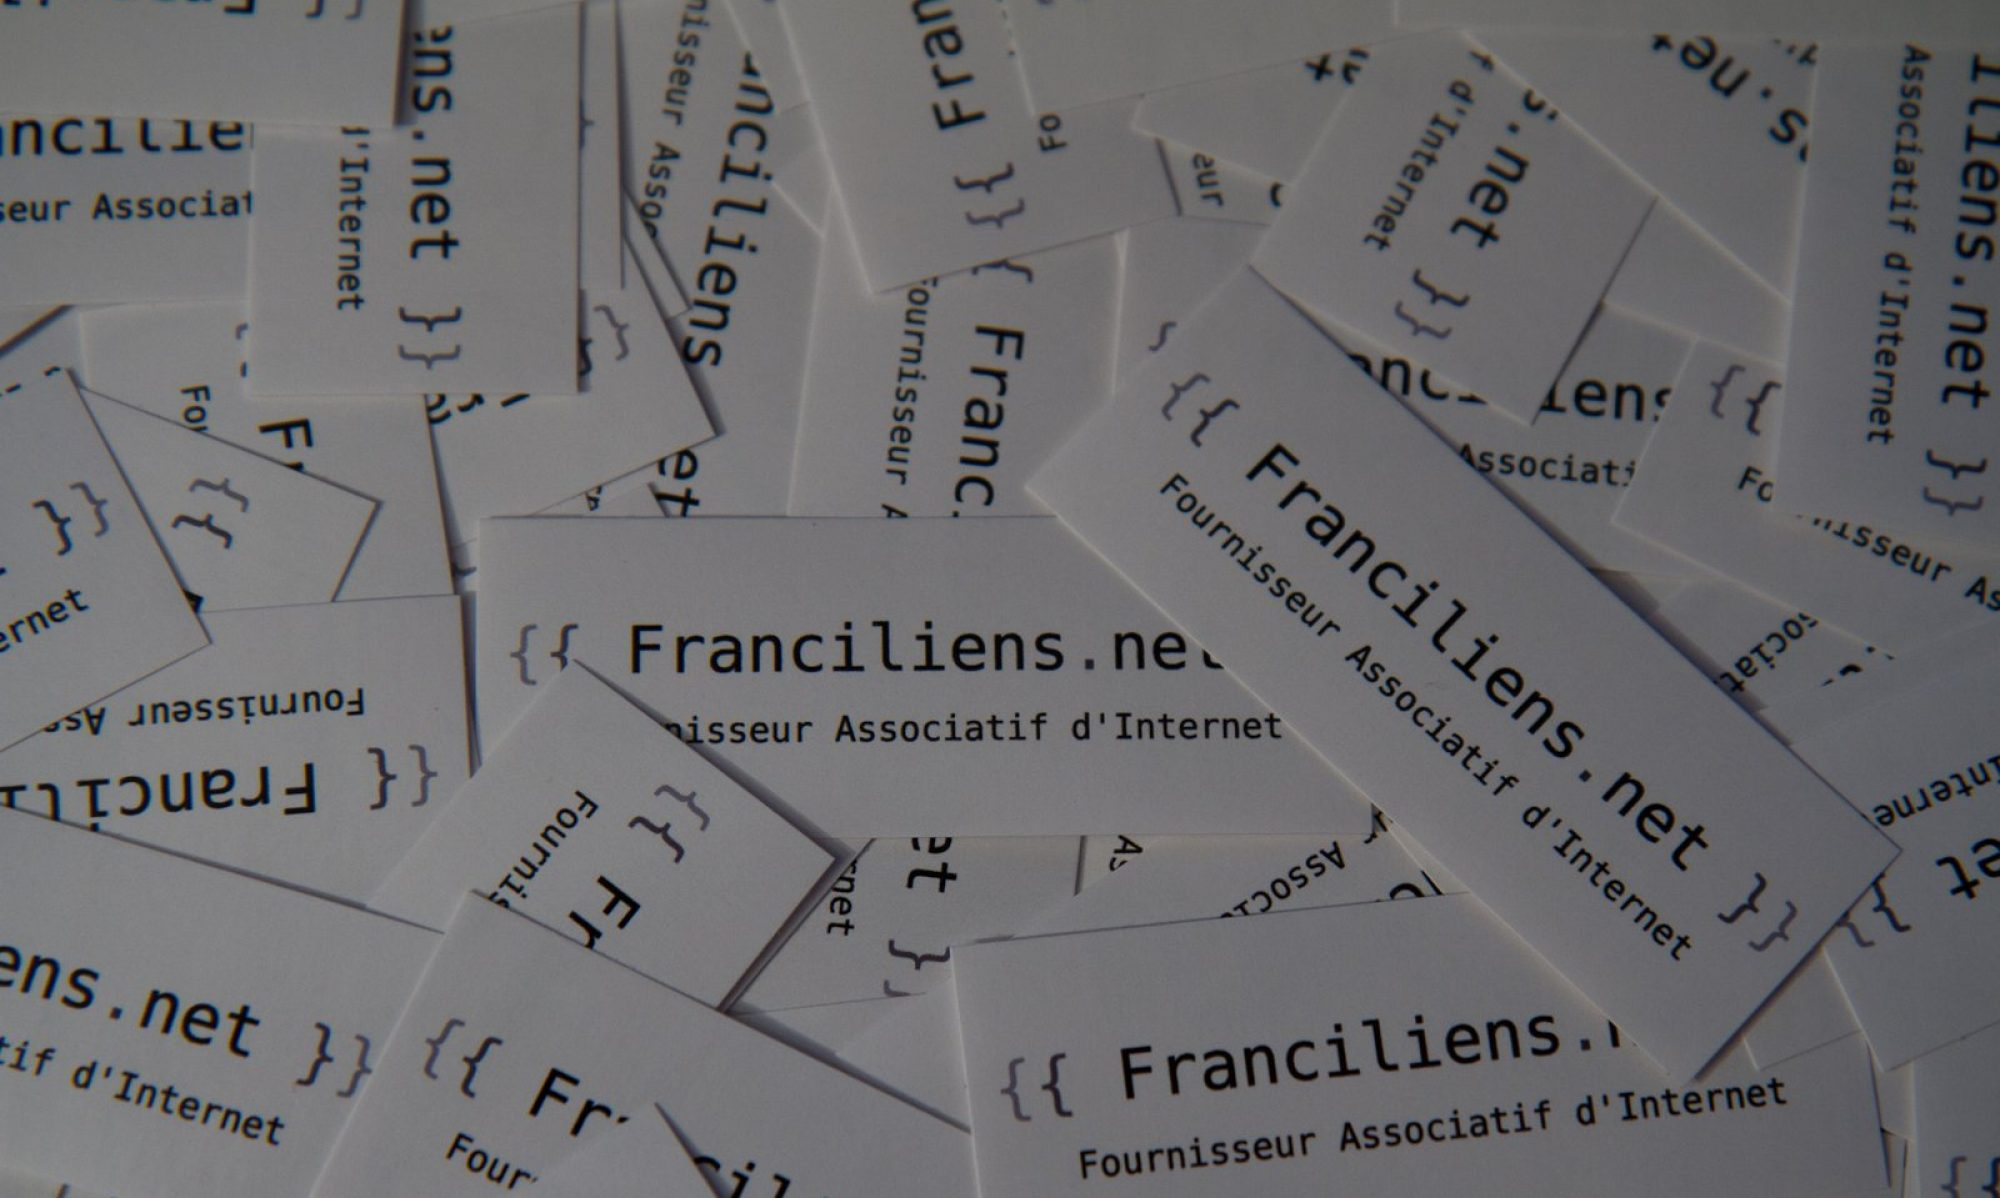 Franciliens.net